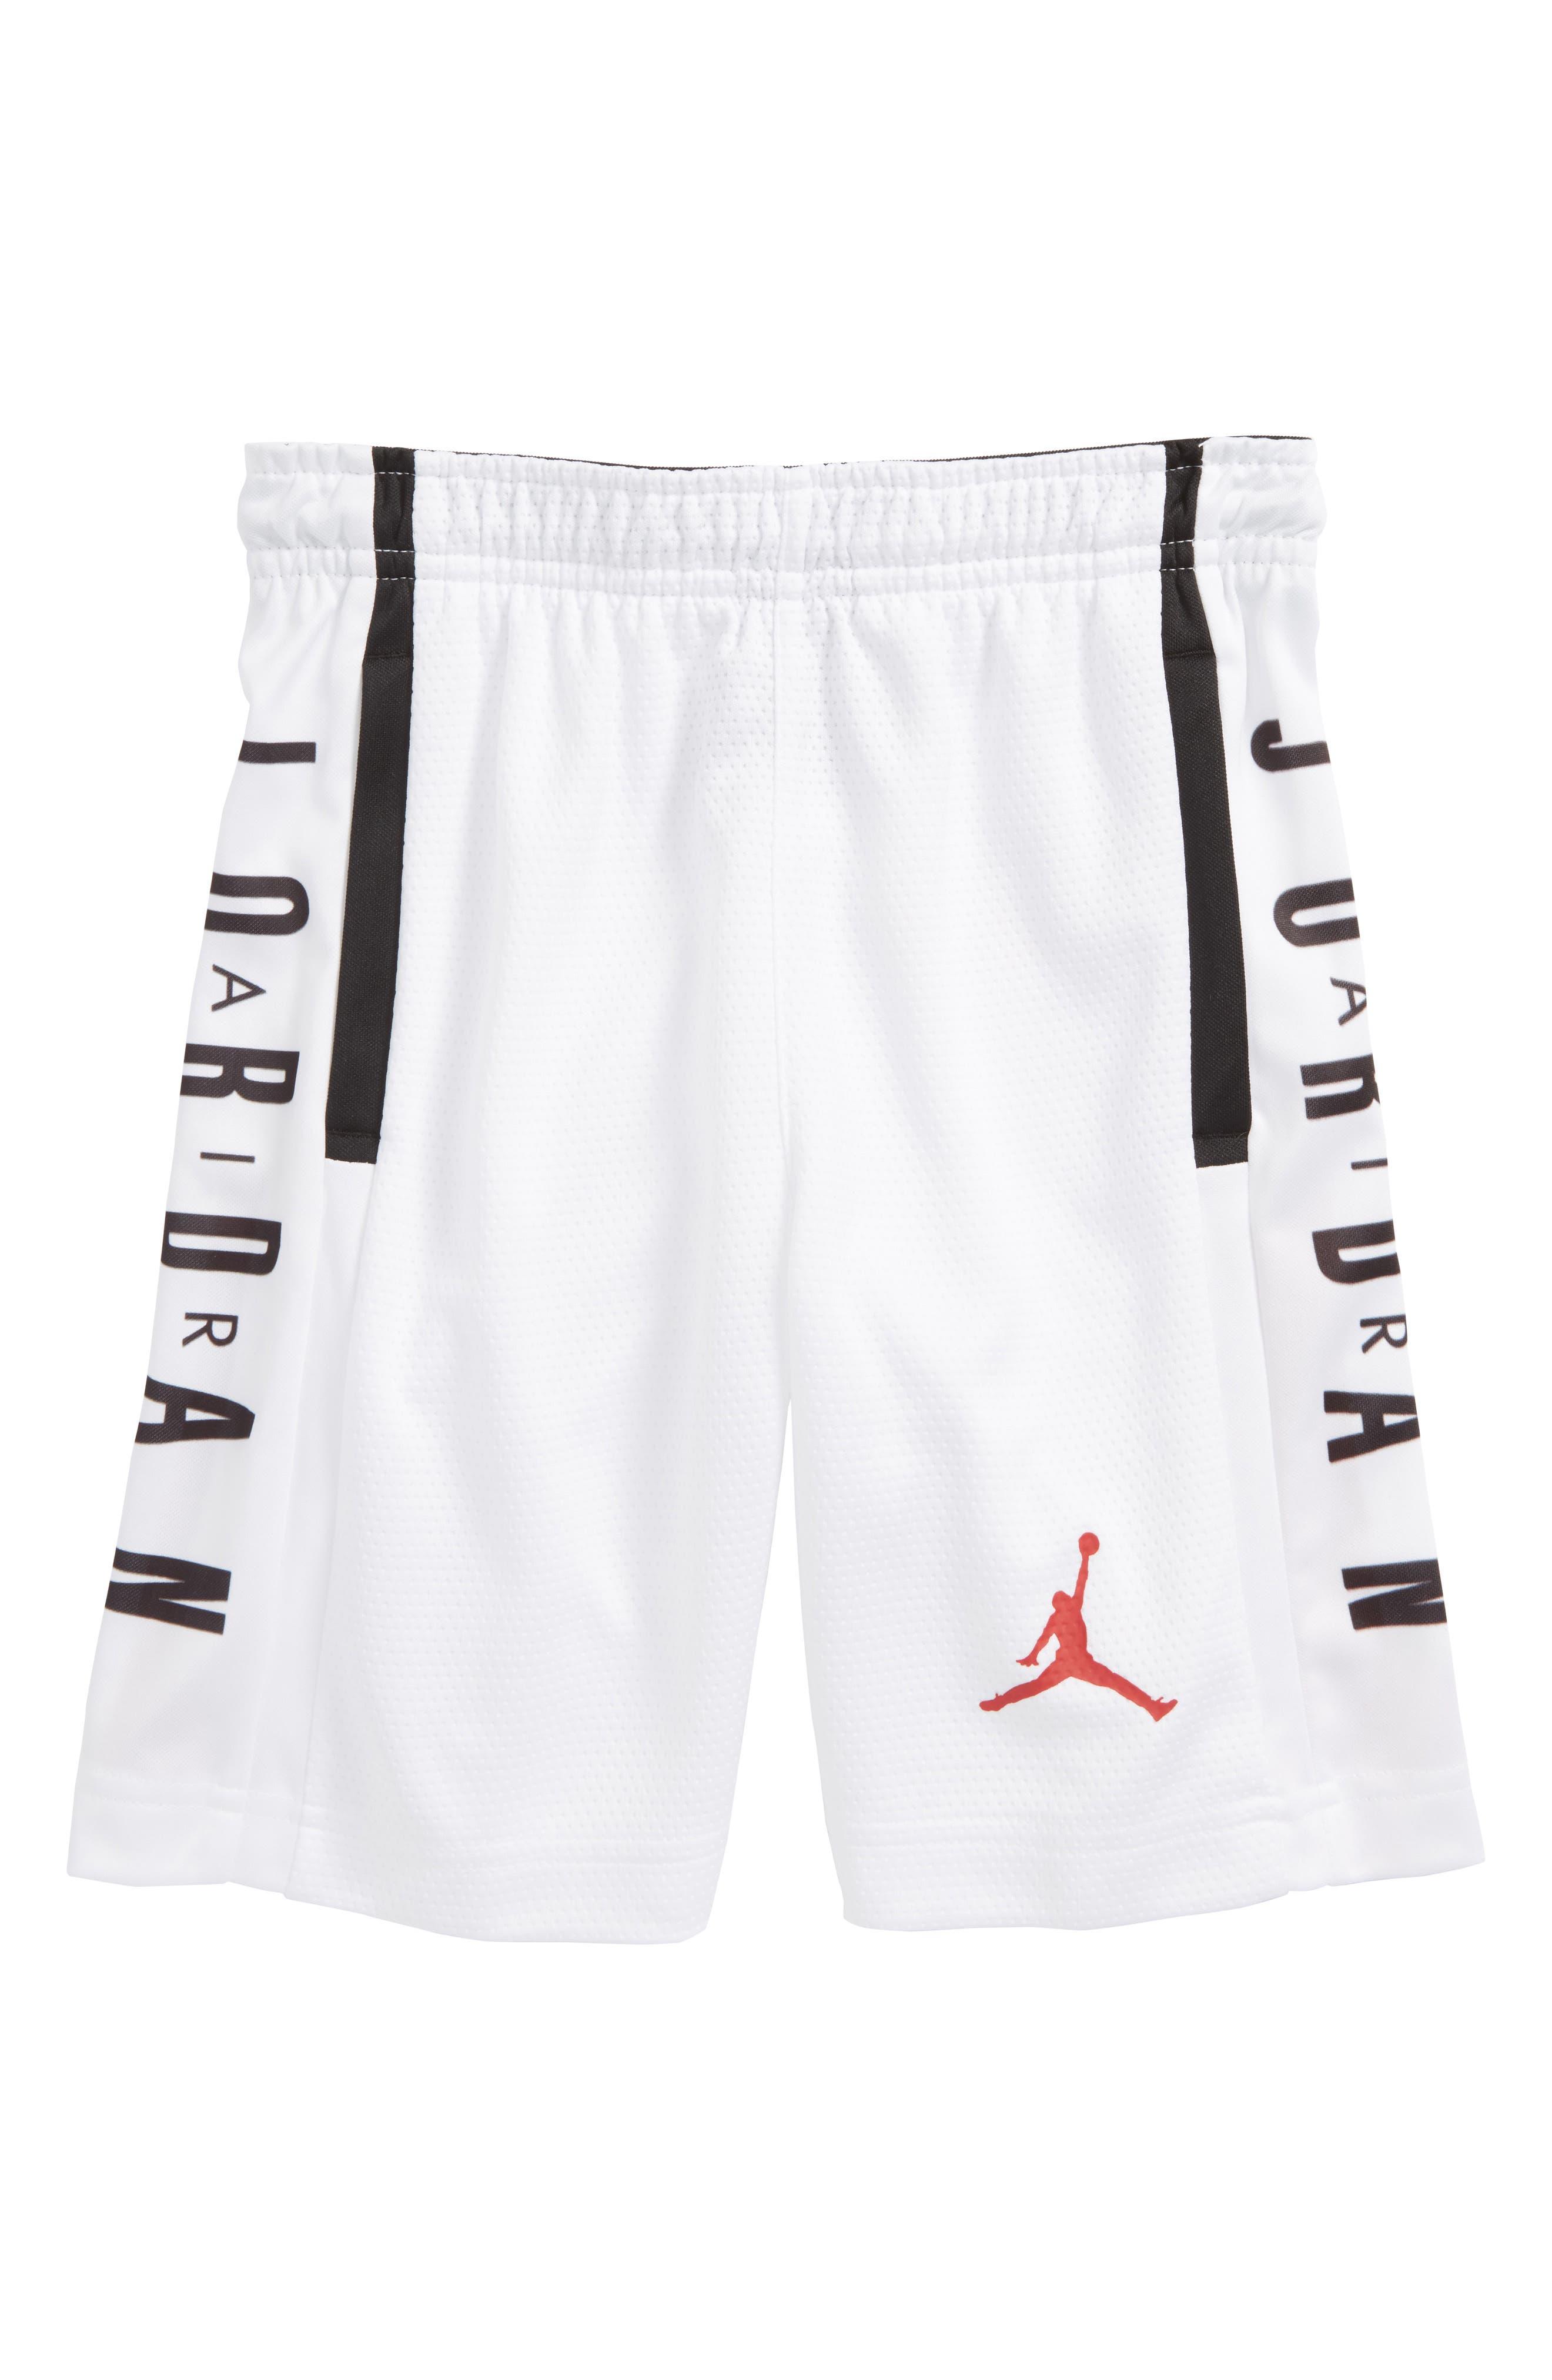 Jordan Rise Graphic Shorts,                         Main,                         color, White